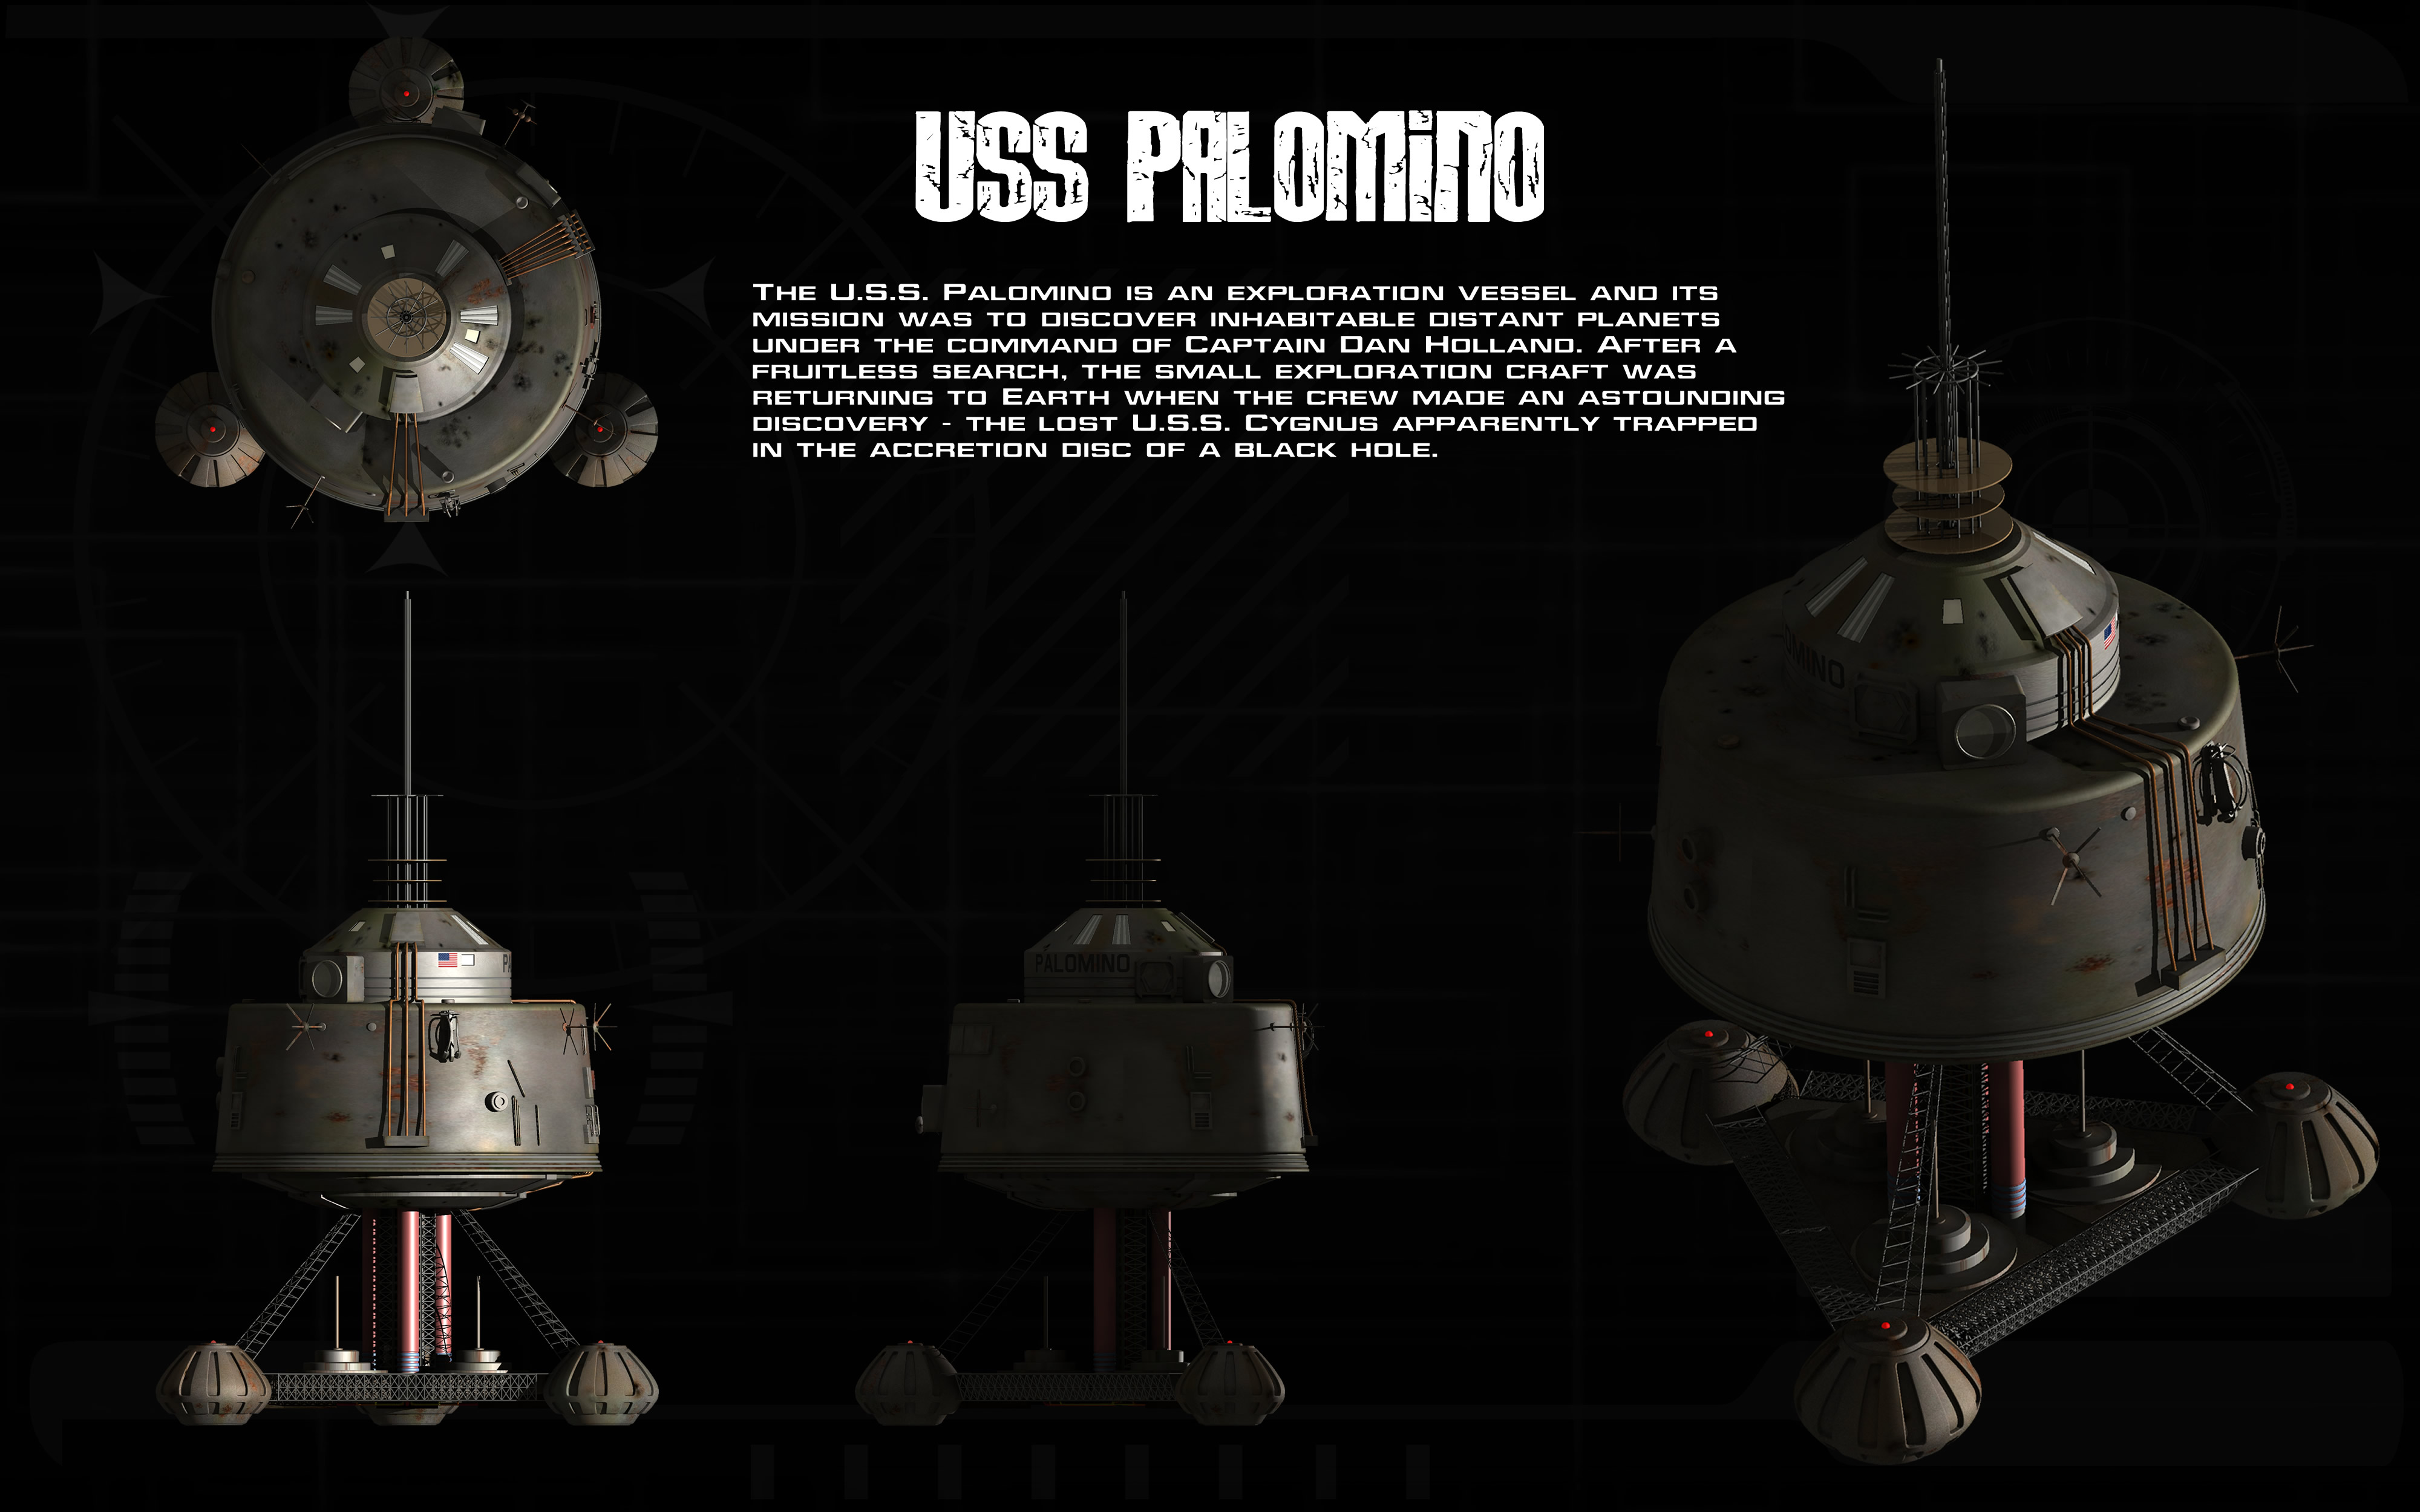 USS Palomino ortho by unusualsuspex on DeviantArt